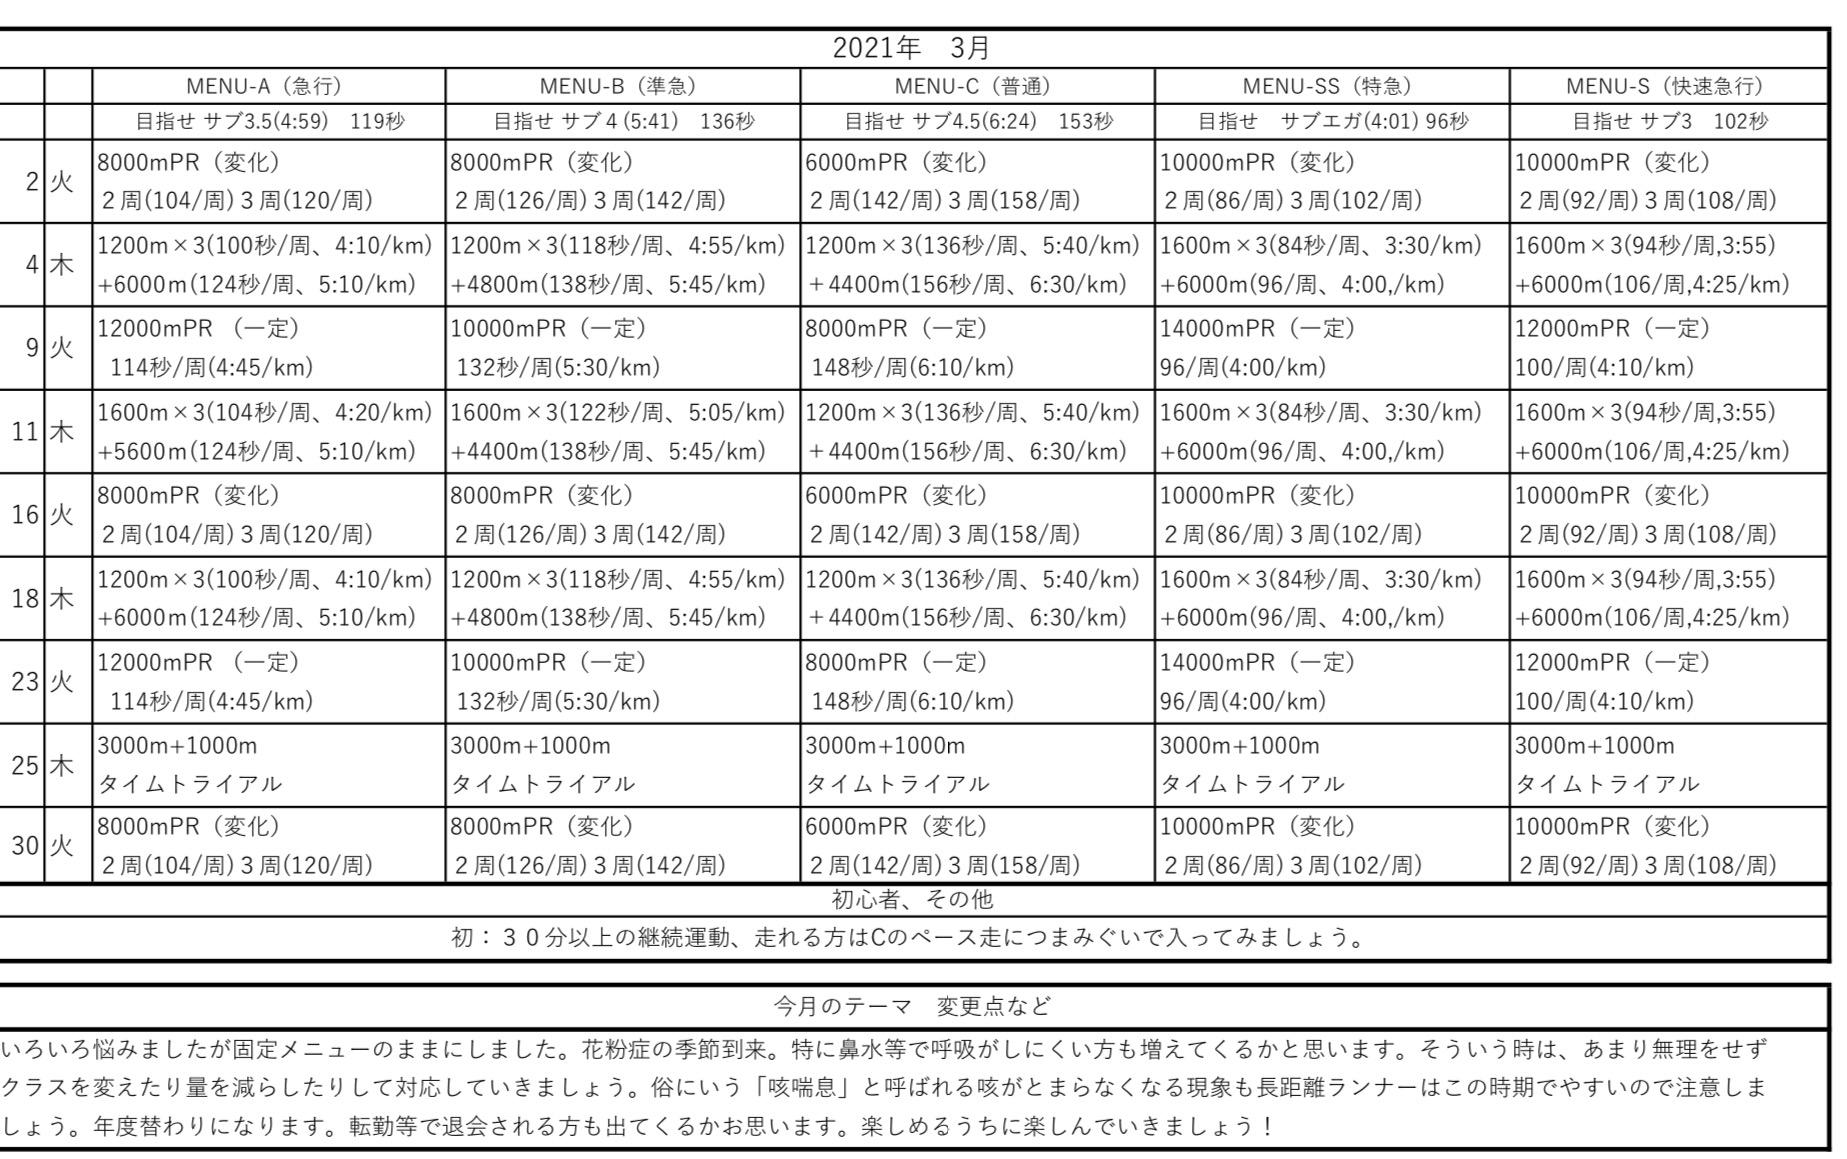 28D3B2B4-2A0F-4AC1-BD9B-59F43820BBD3